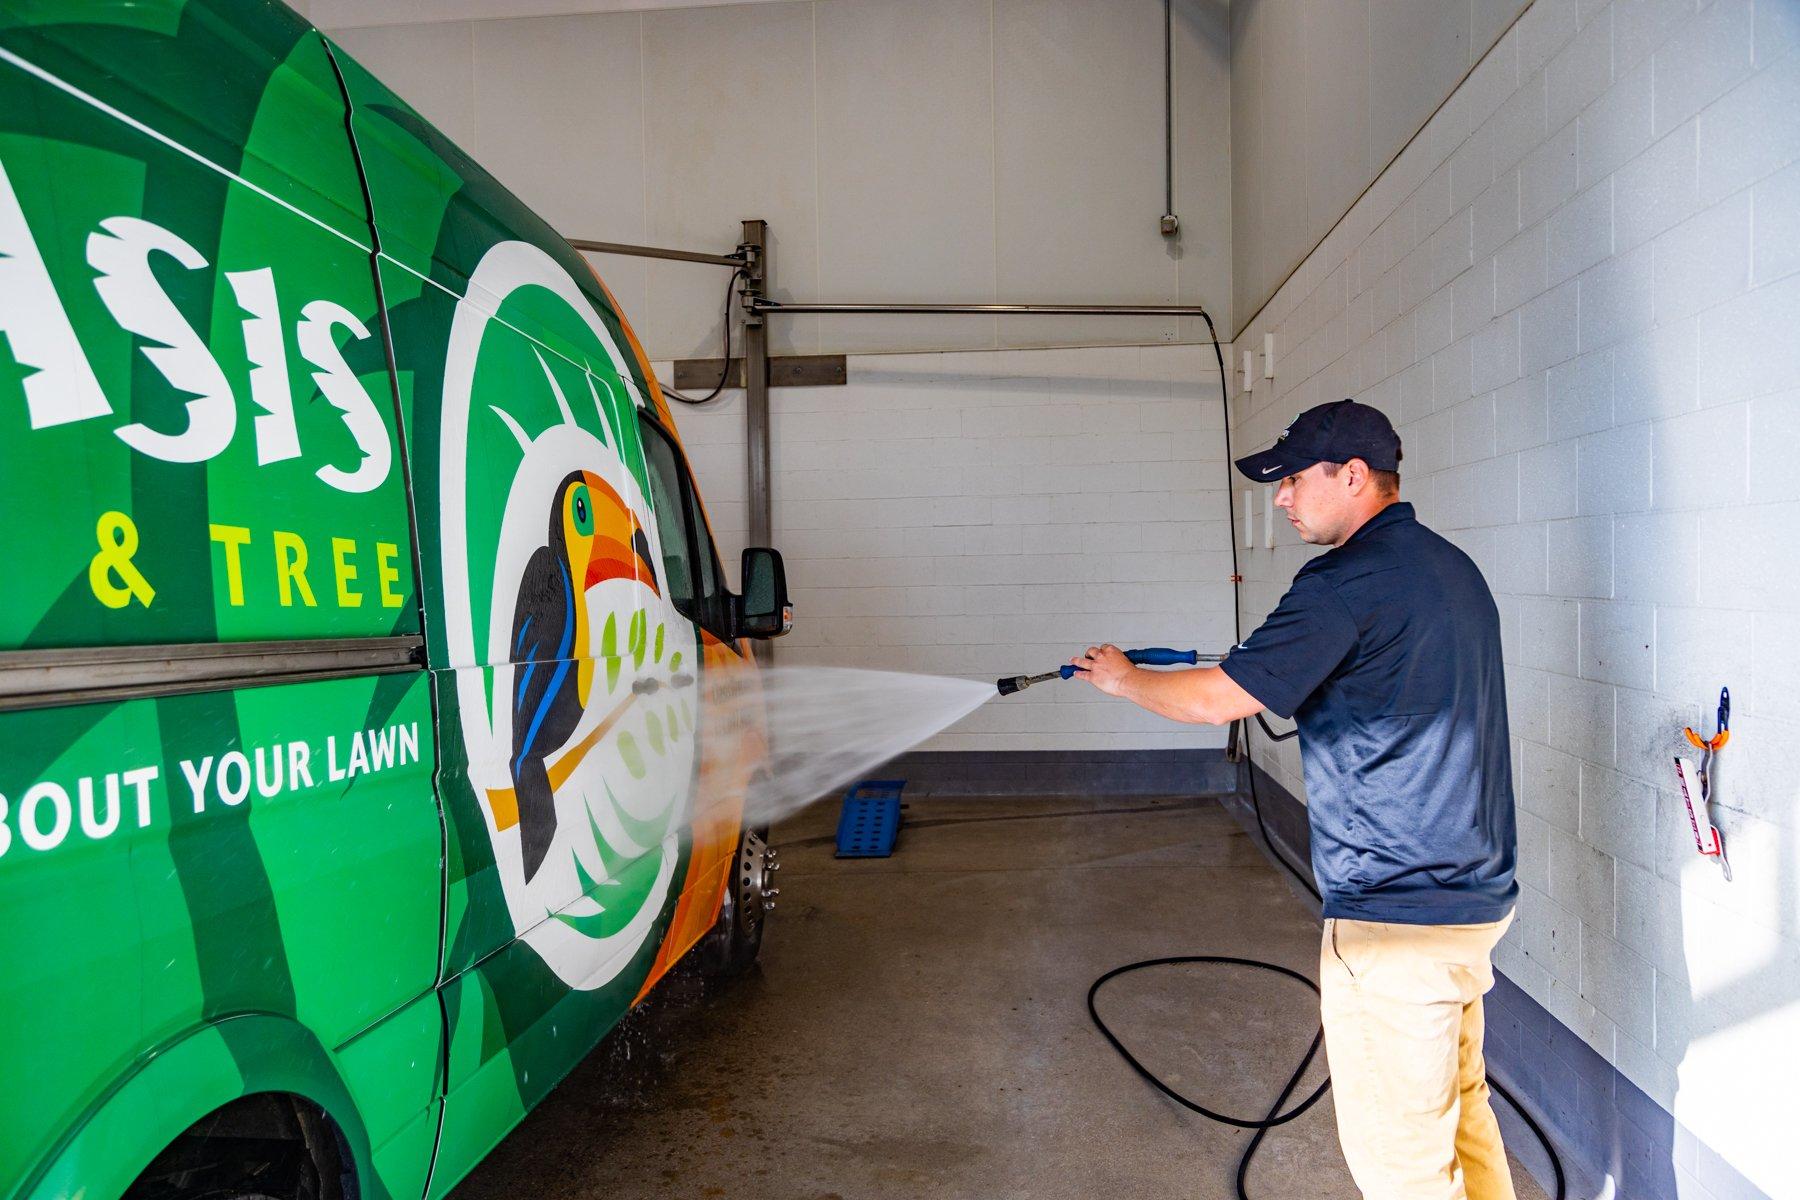 Oasis crew washing van and equipment in wash bay